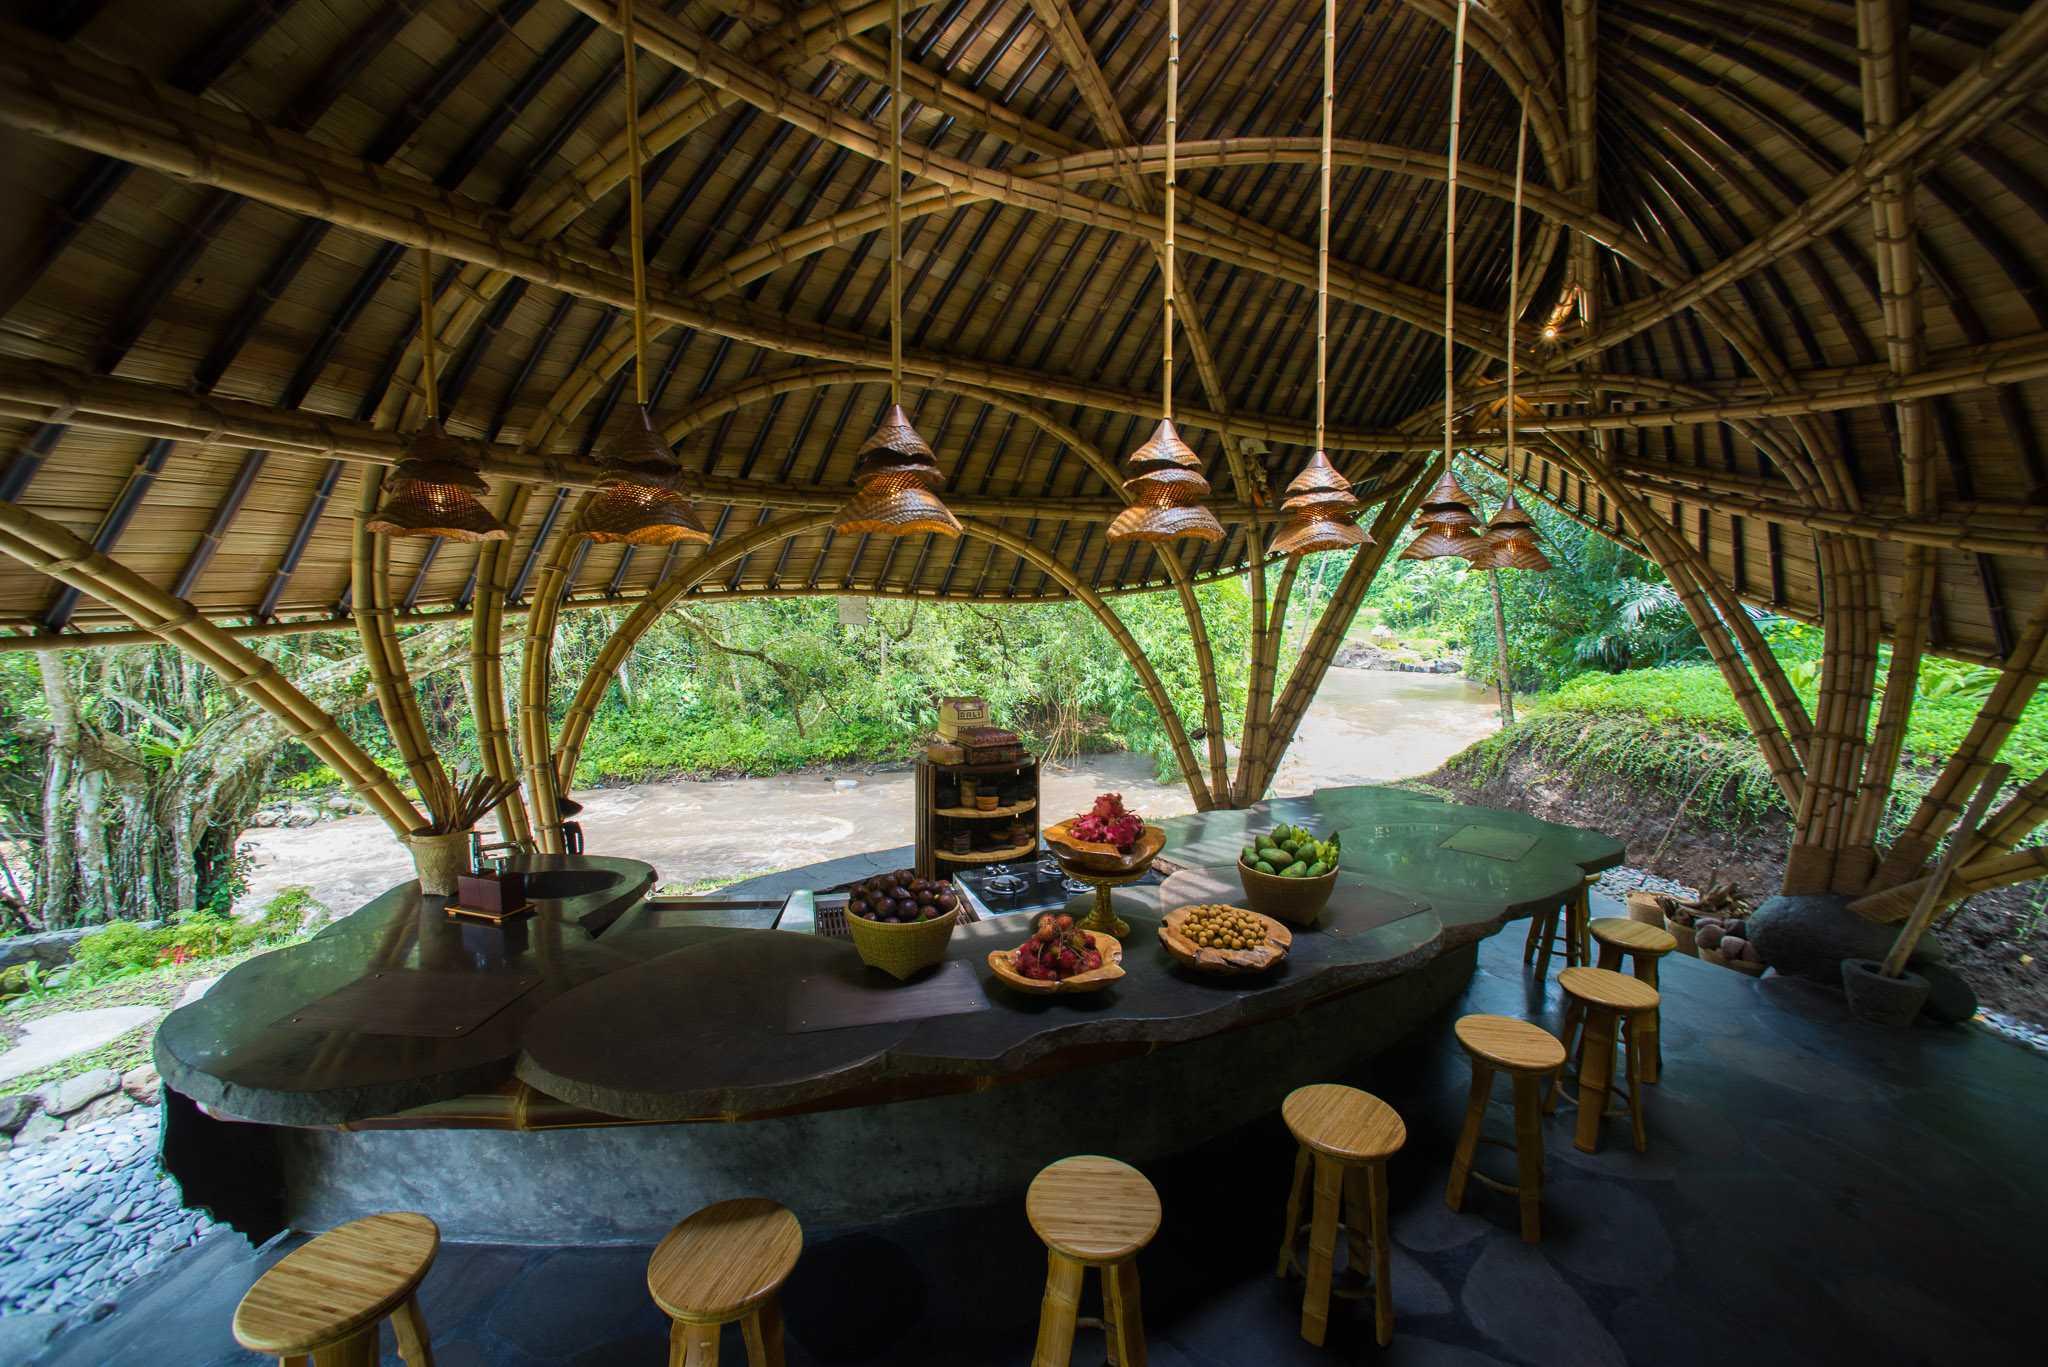 Agung Budi Raharsa | Architecture & Engineering Sokasi Bamboo Cooking Class / School - Bali Bali, Indonesia Bali, Indonesia Agung-Budi-Raharsa-Sokasi-Cooking-Class-School-Bali   88754